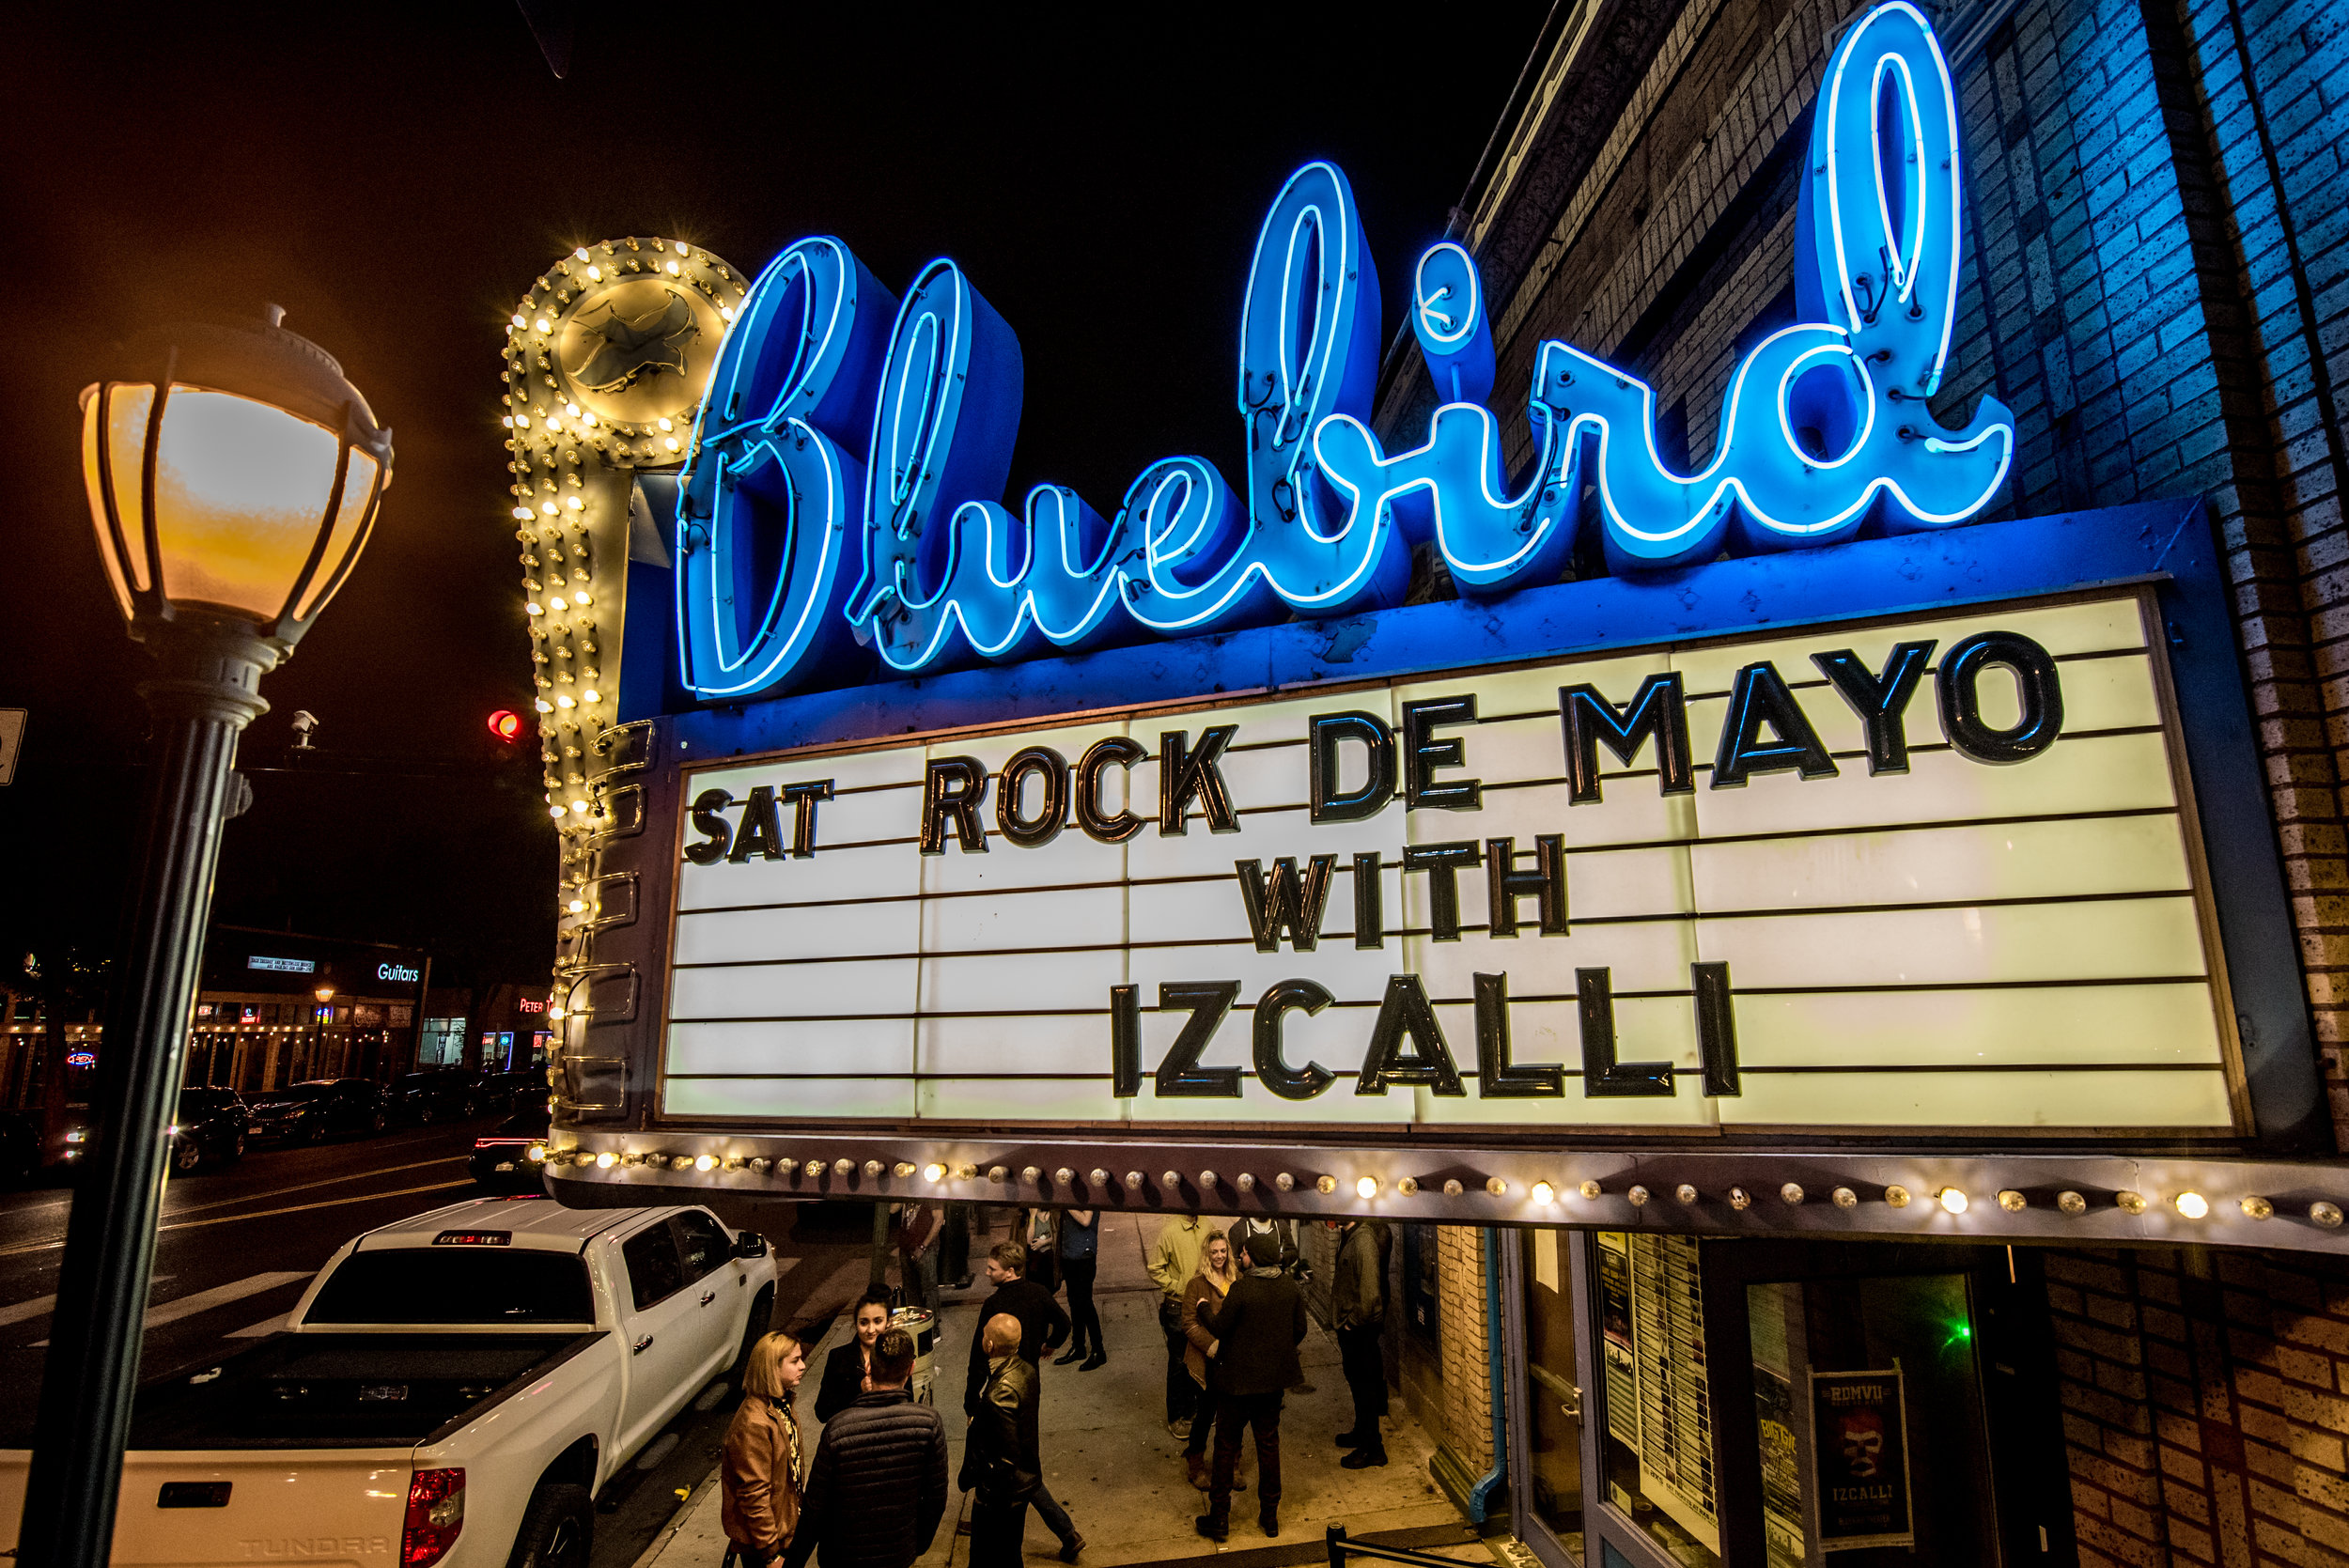 iZCALLi_Rock de Mayo-1.jpg